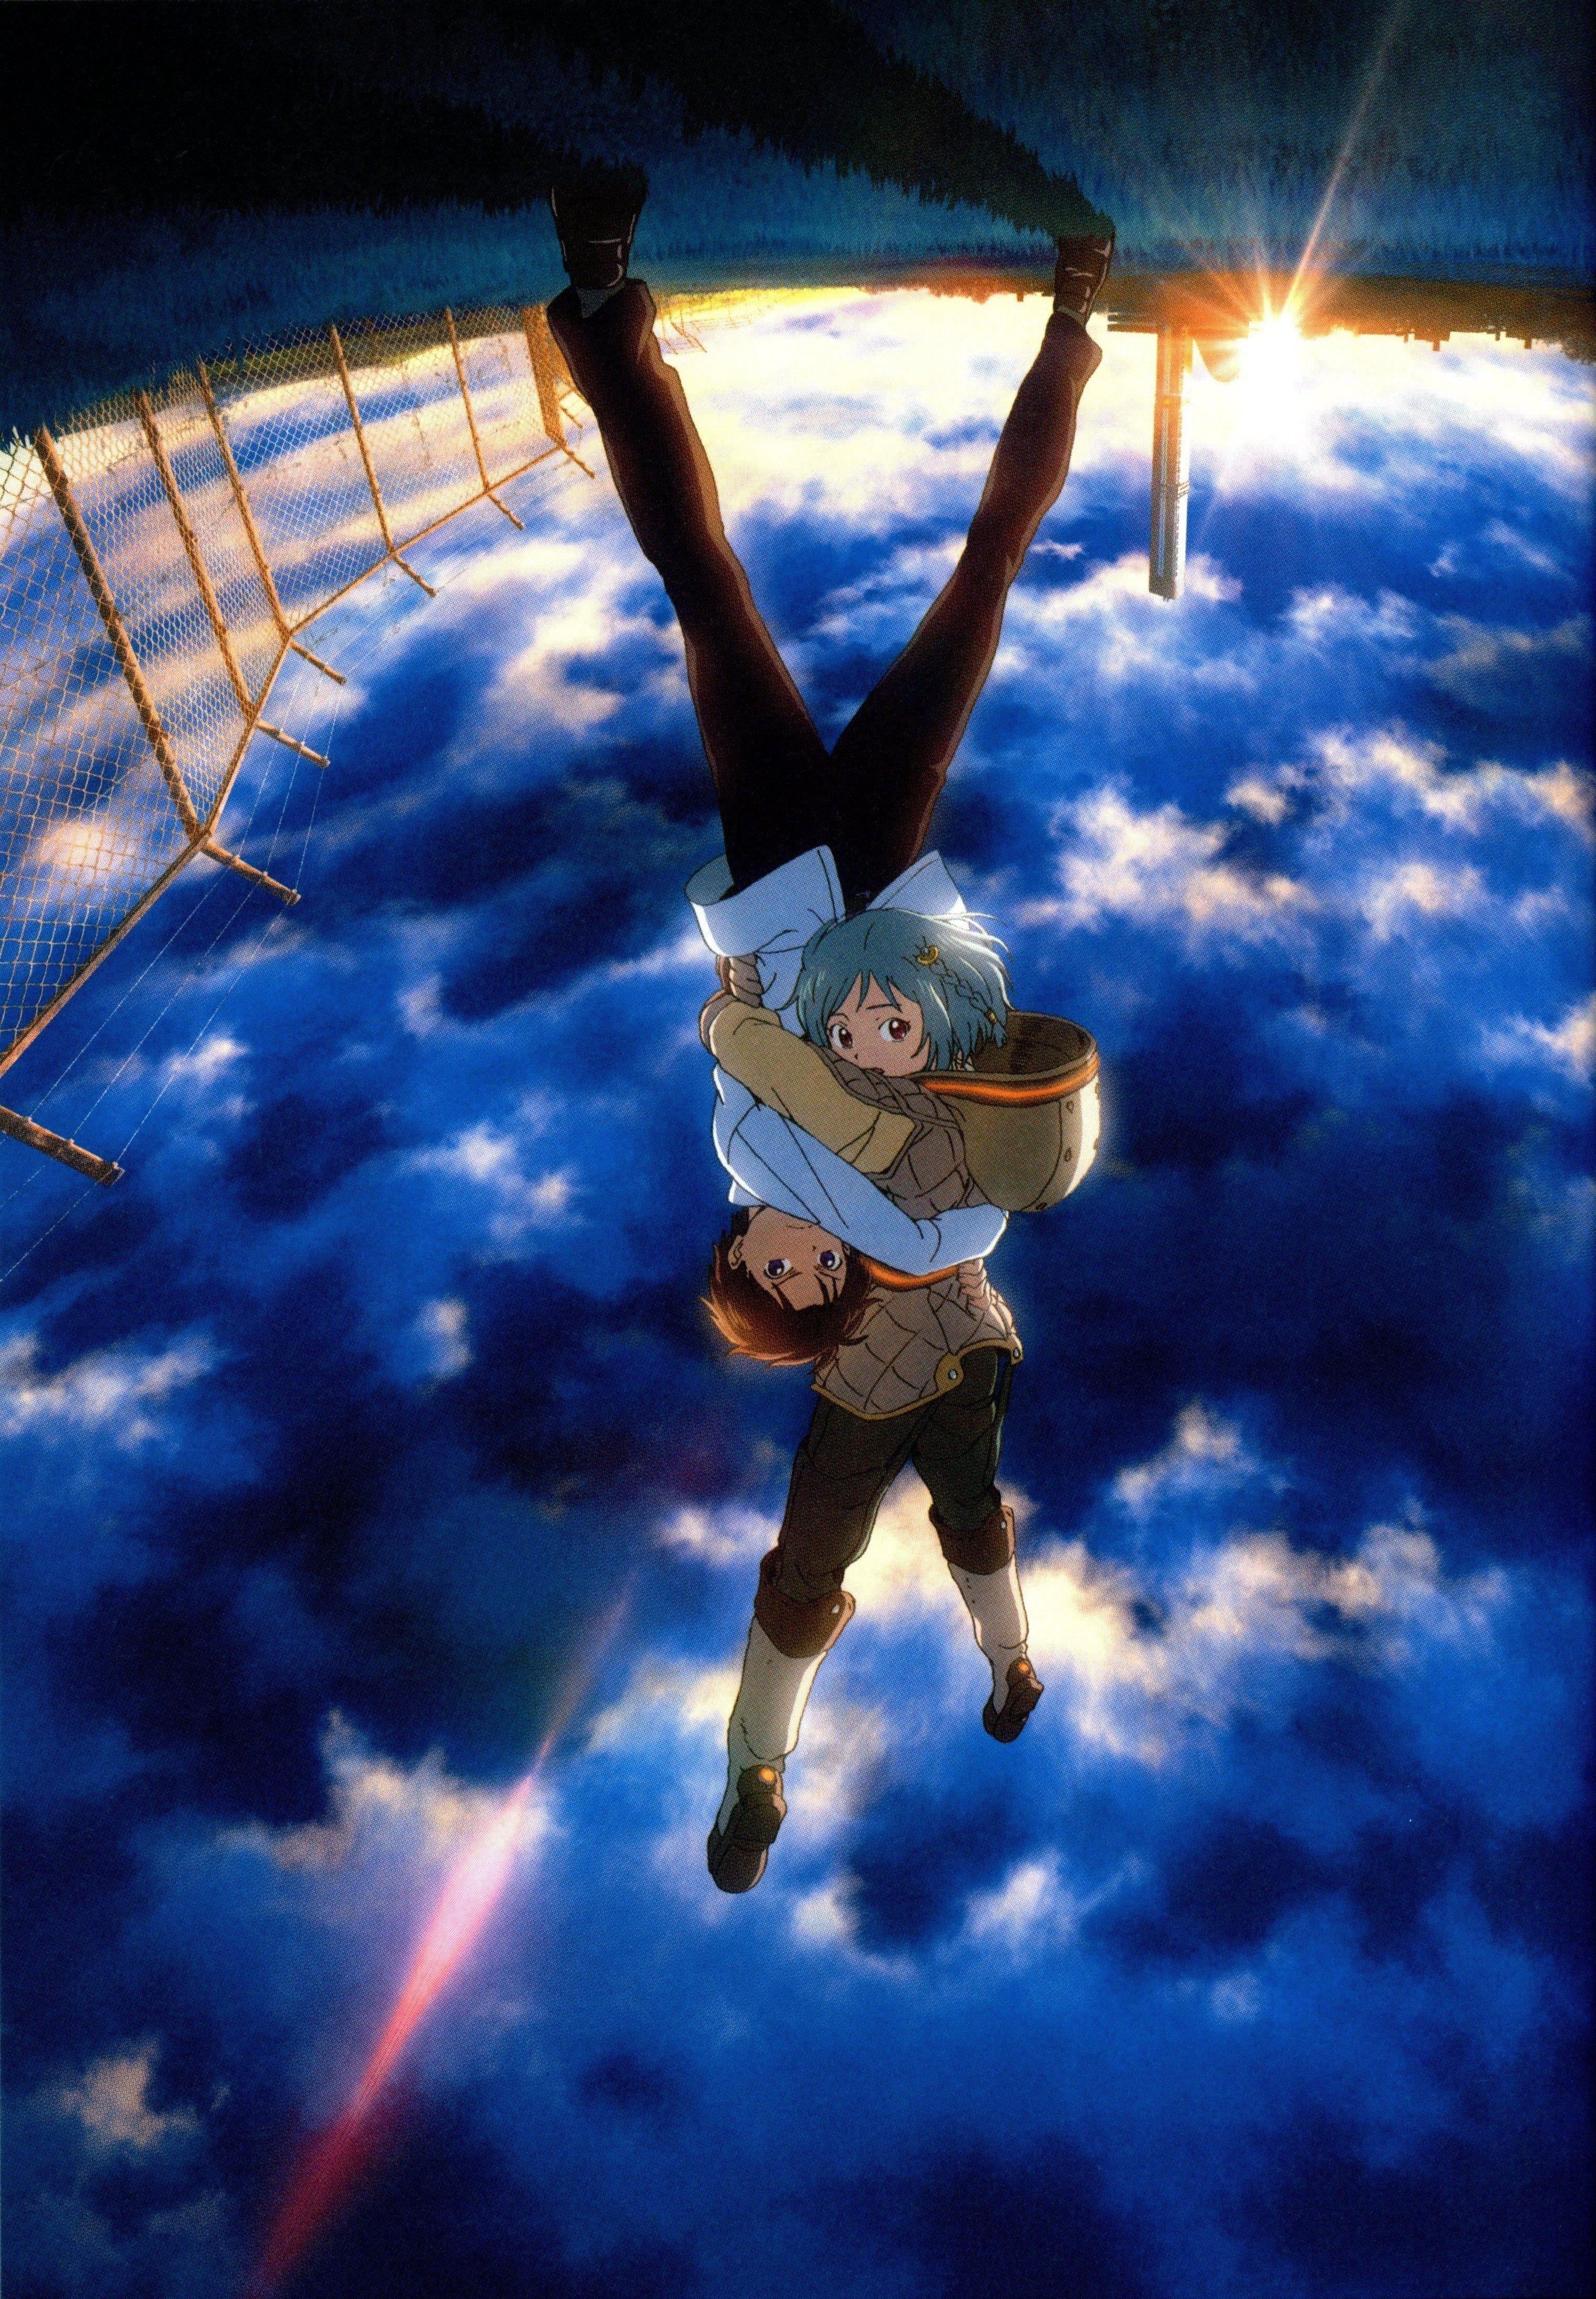 Pin by *Anisazu * on Anime & Manga Illustrations Anime